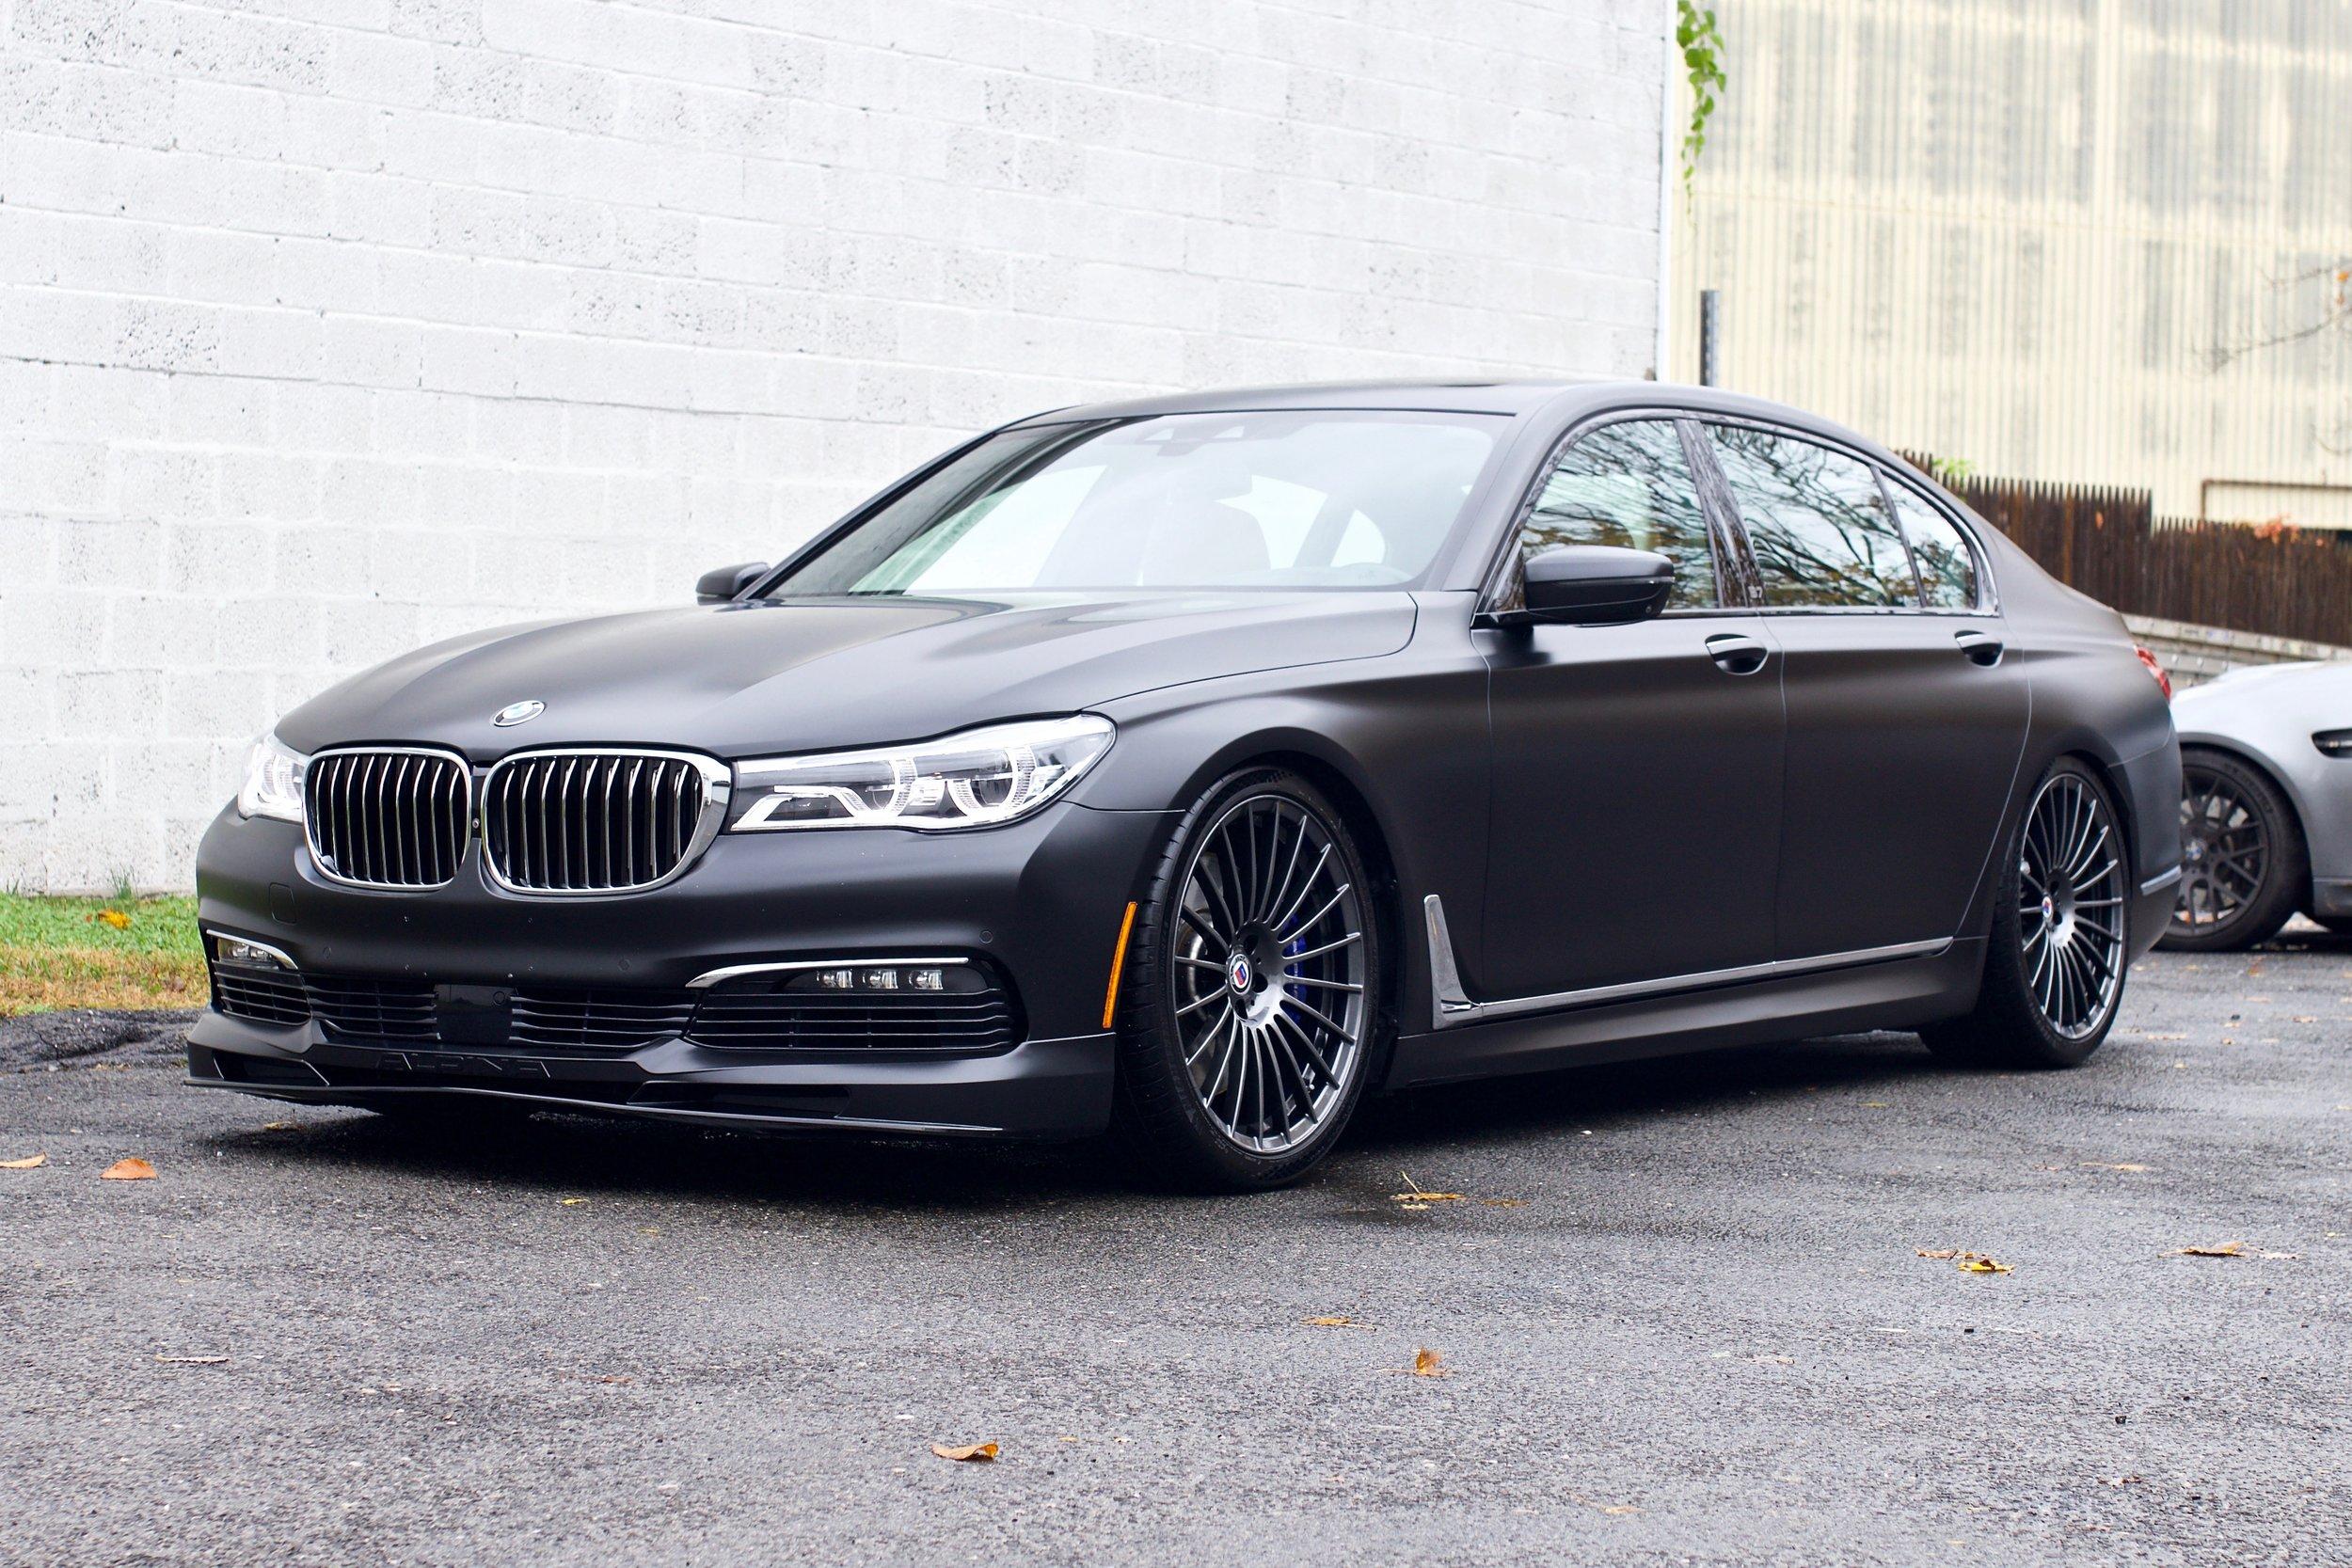 BMW B7 Alpina - Xpel Stealth Paint Protection Film - New Car Detail - Wheels Powdercoated - CQuartz Finest Reserve